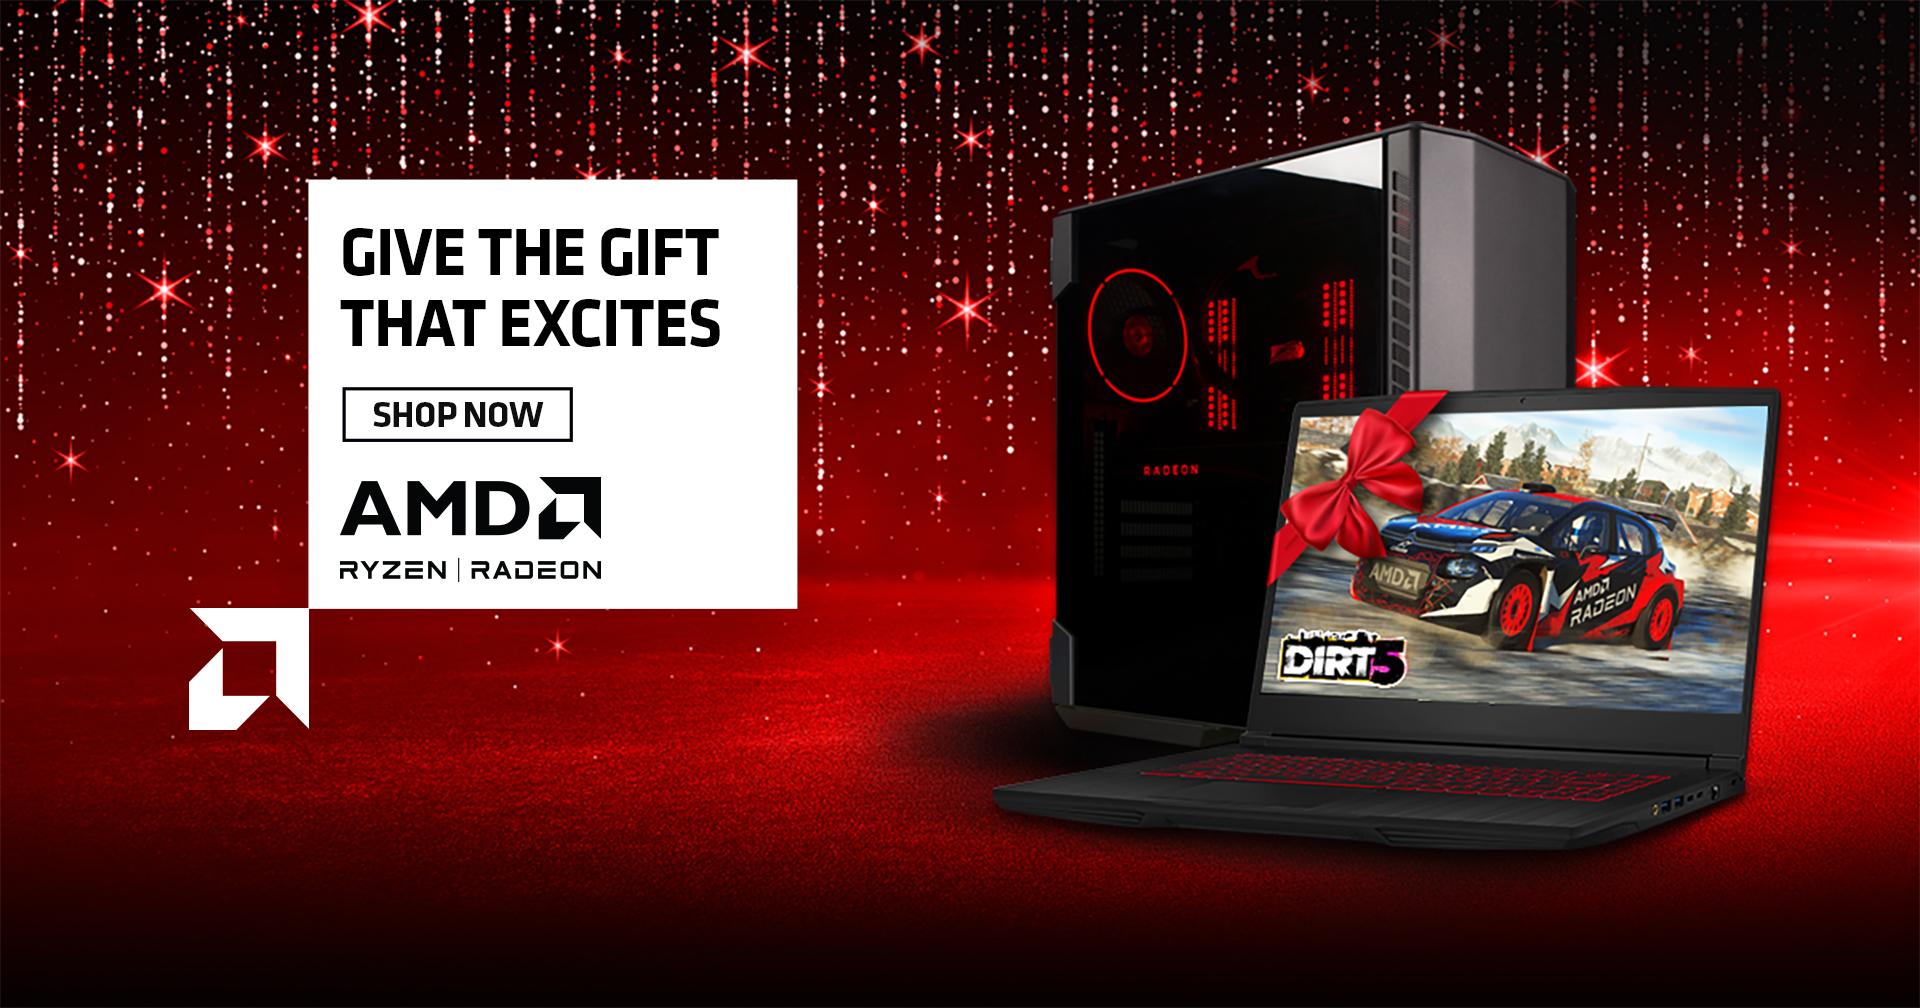 The AMD Ryzen 4000 H-Series raises the bar for gaming laptops